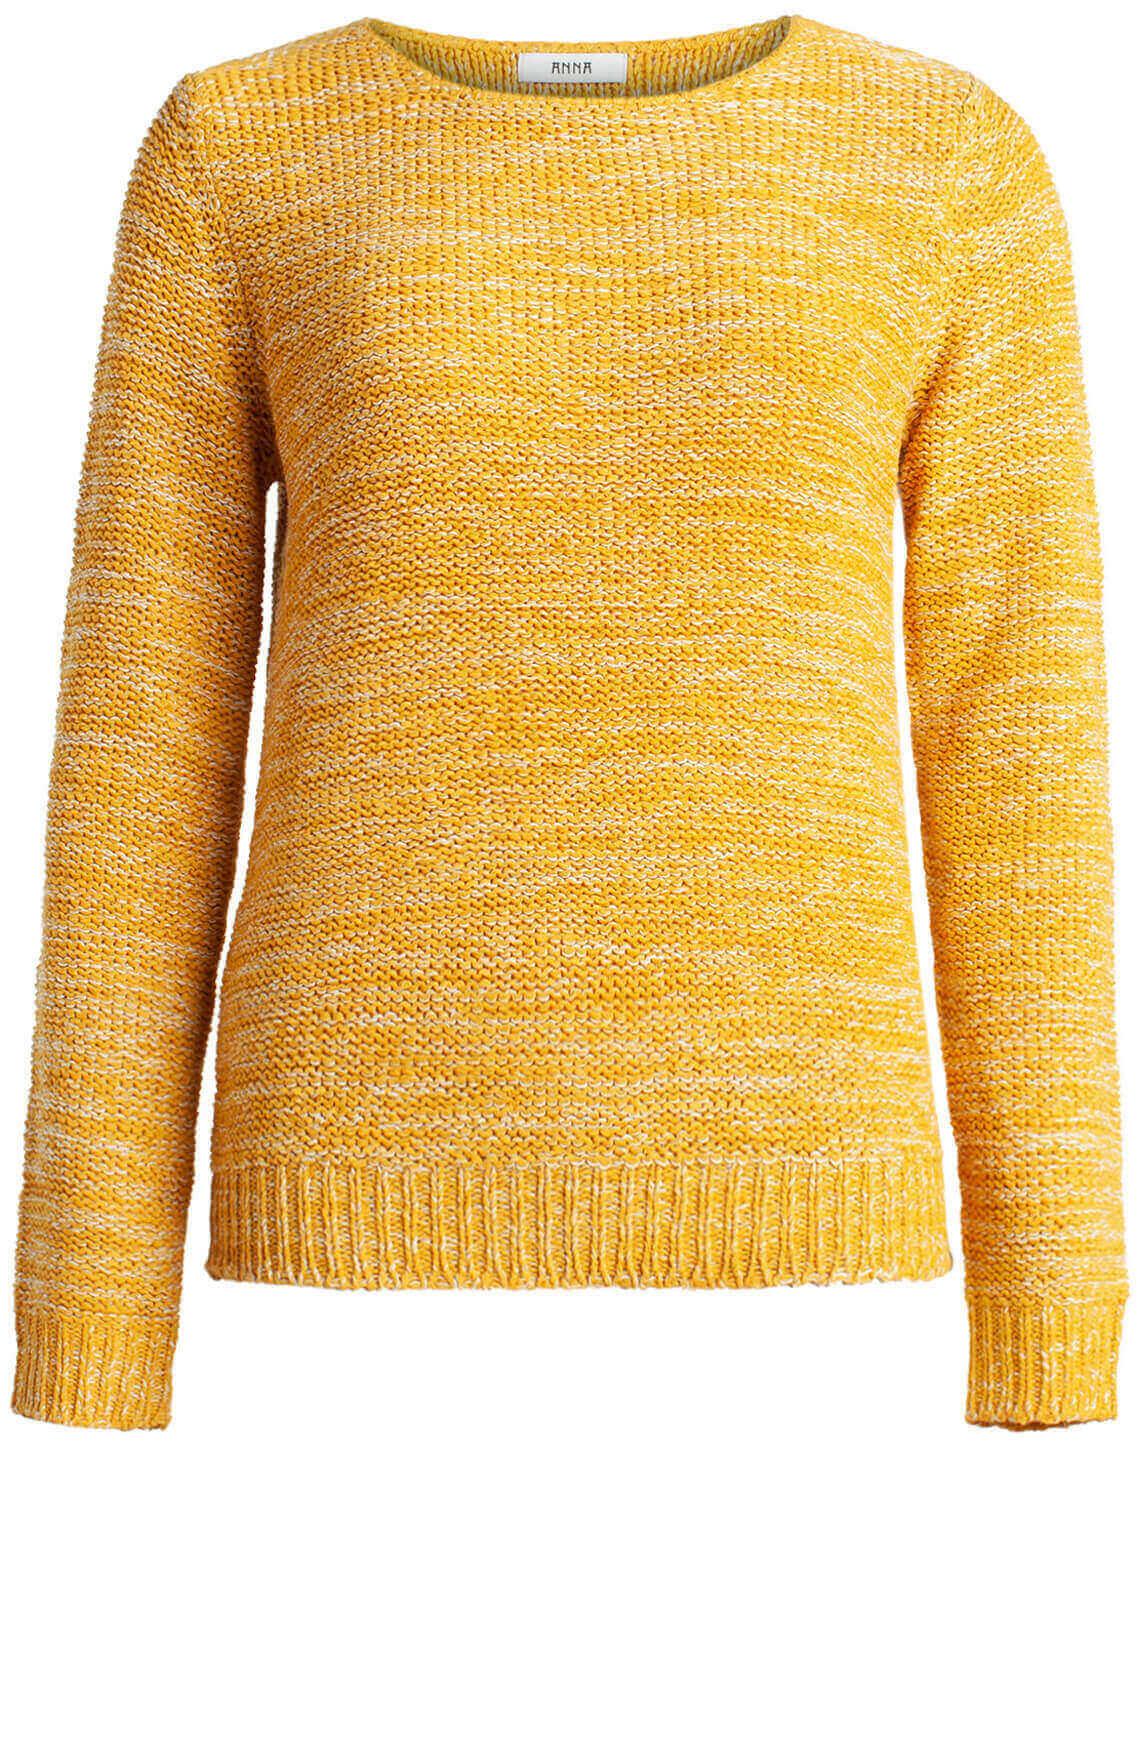 Anna Dames Pullover in bandgaren geel